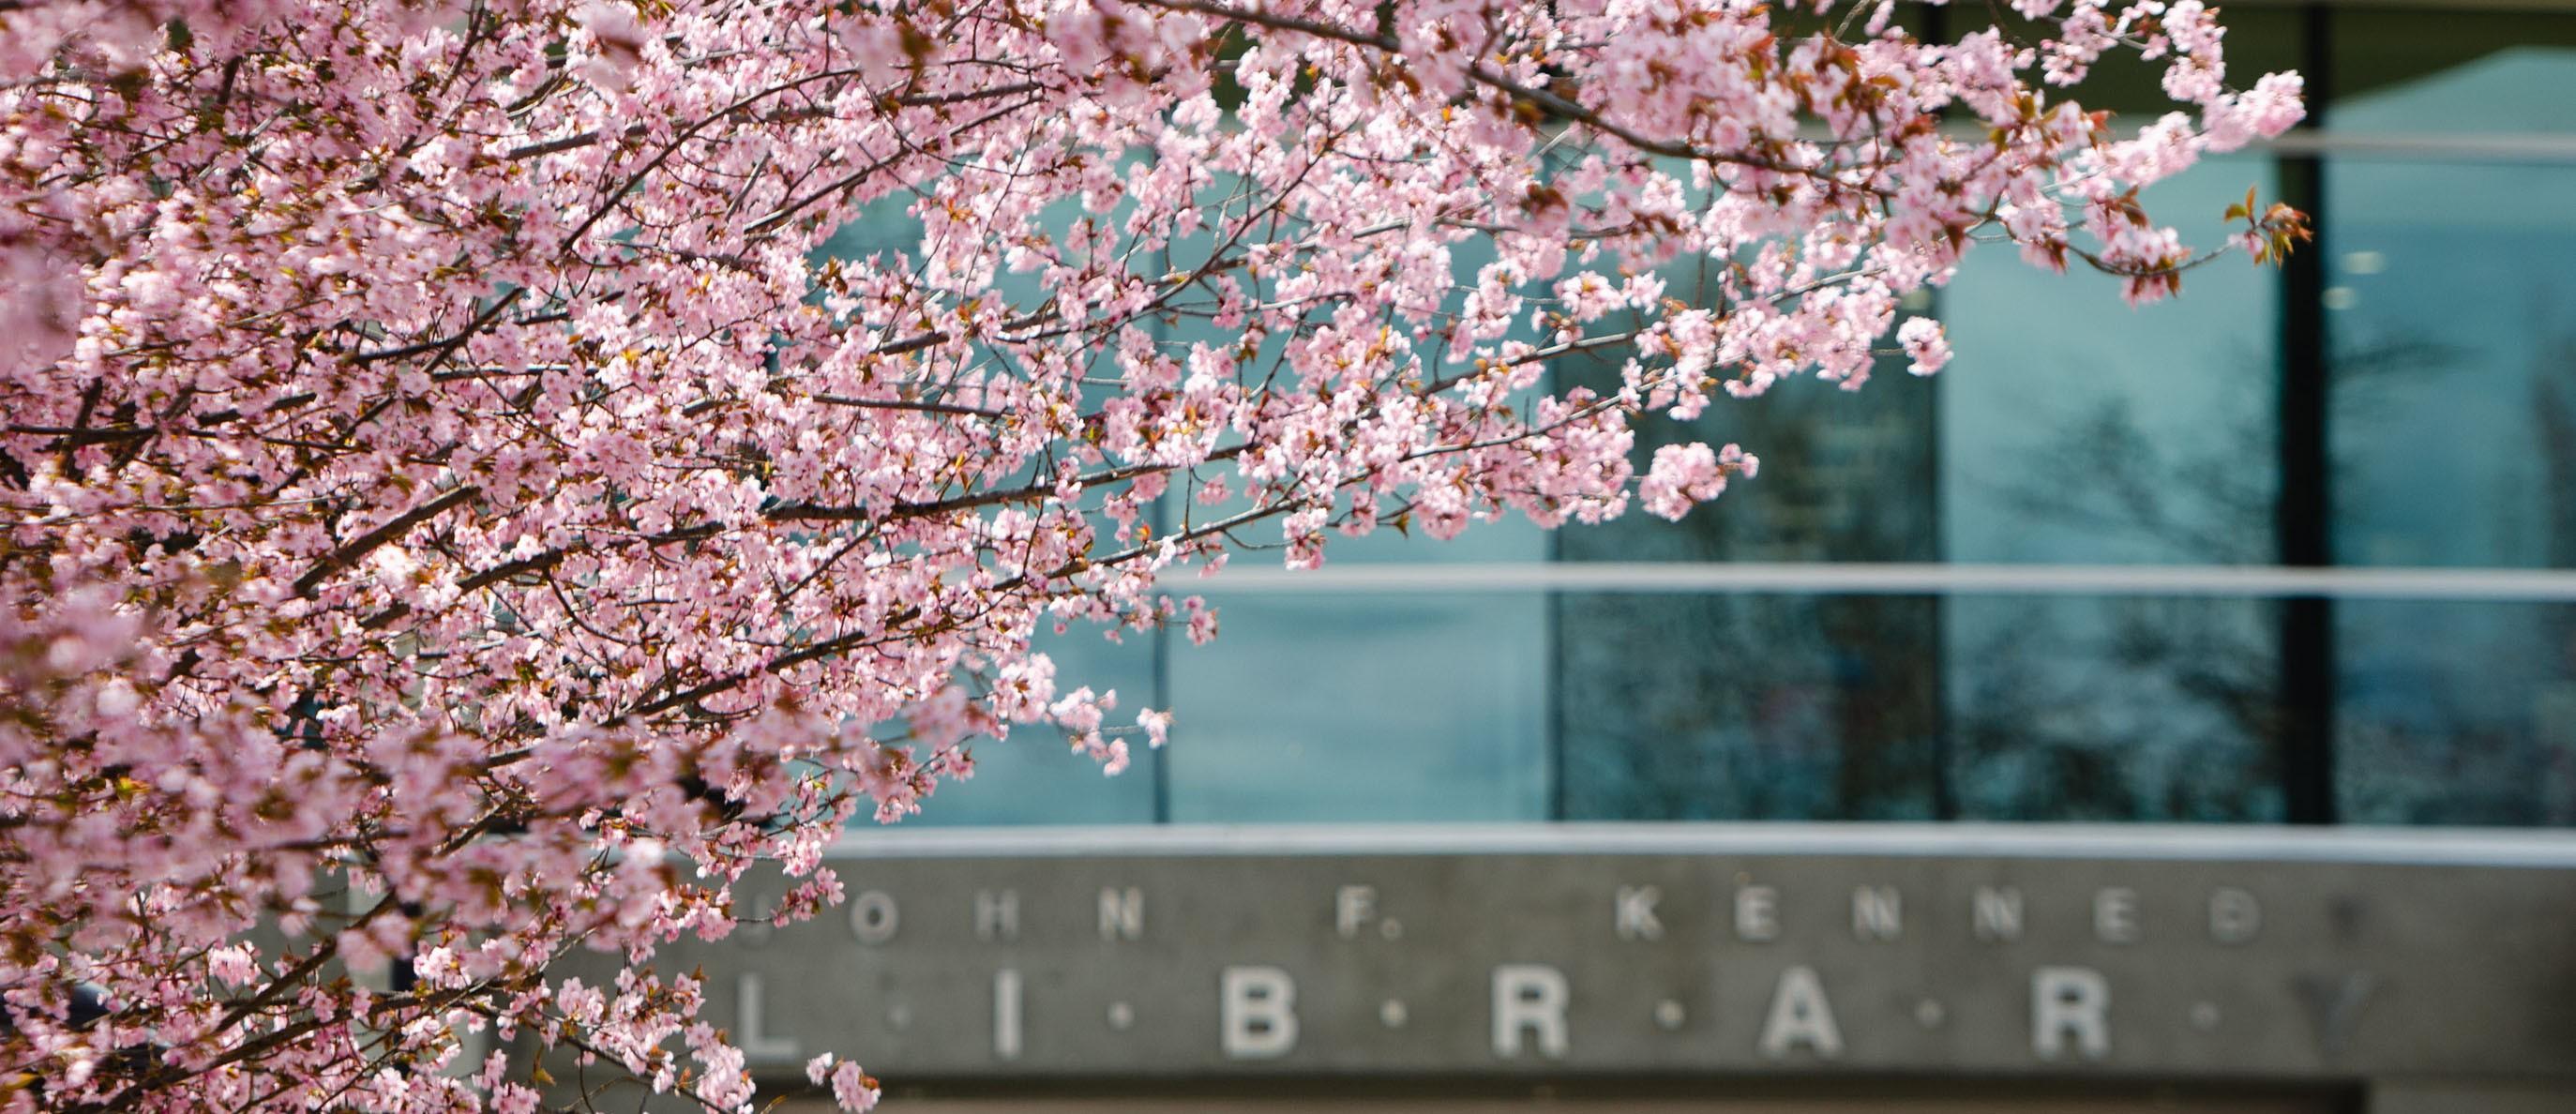 JFK Library Spring